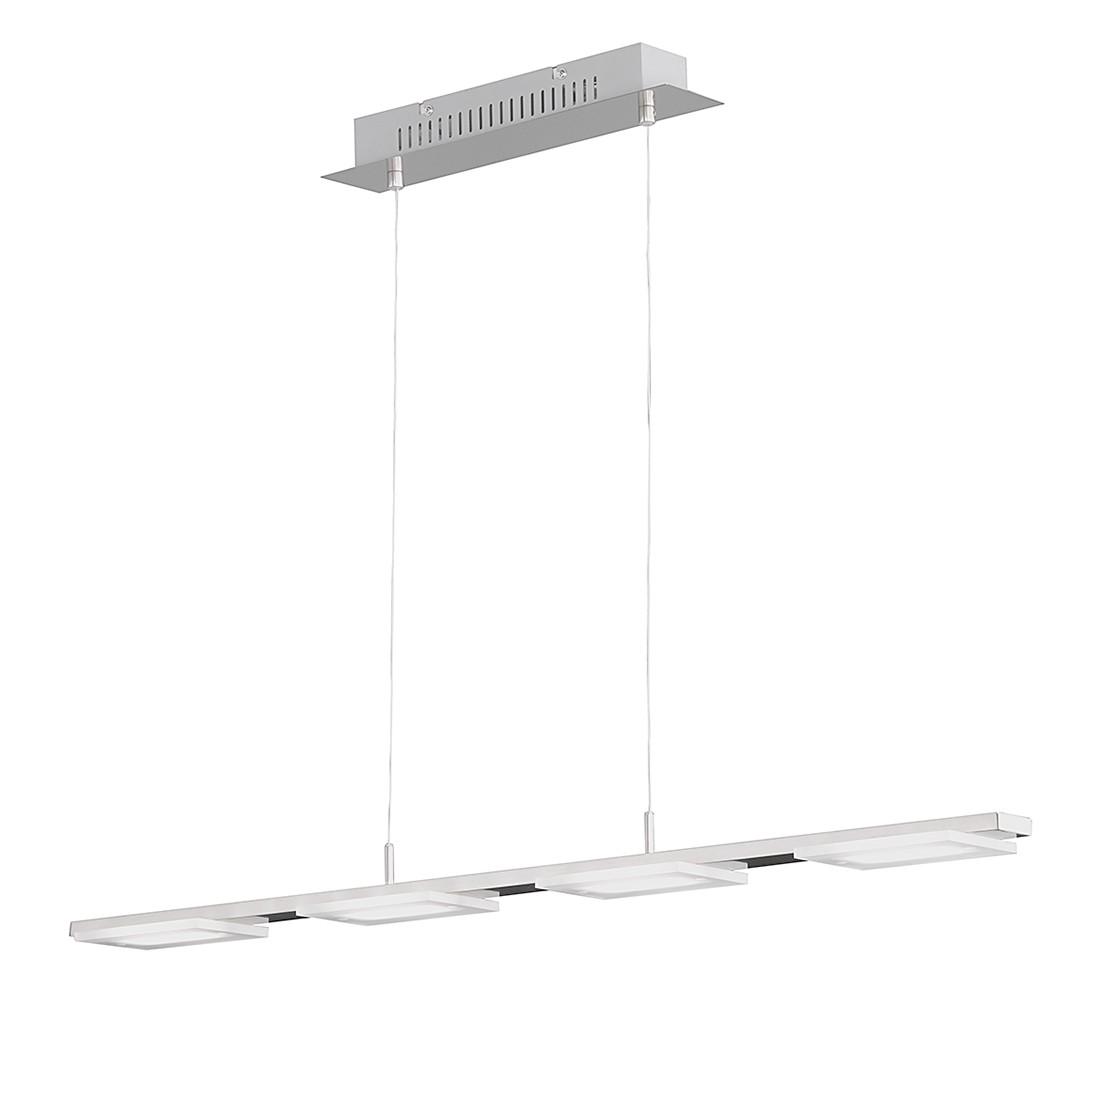 energie A+, Plafondlamp VERSO metaal-glas 4 lichtbronnen, Action